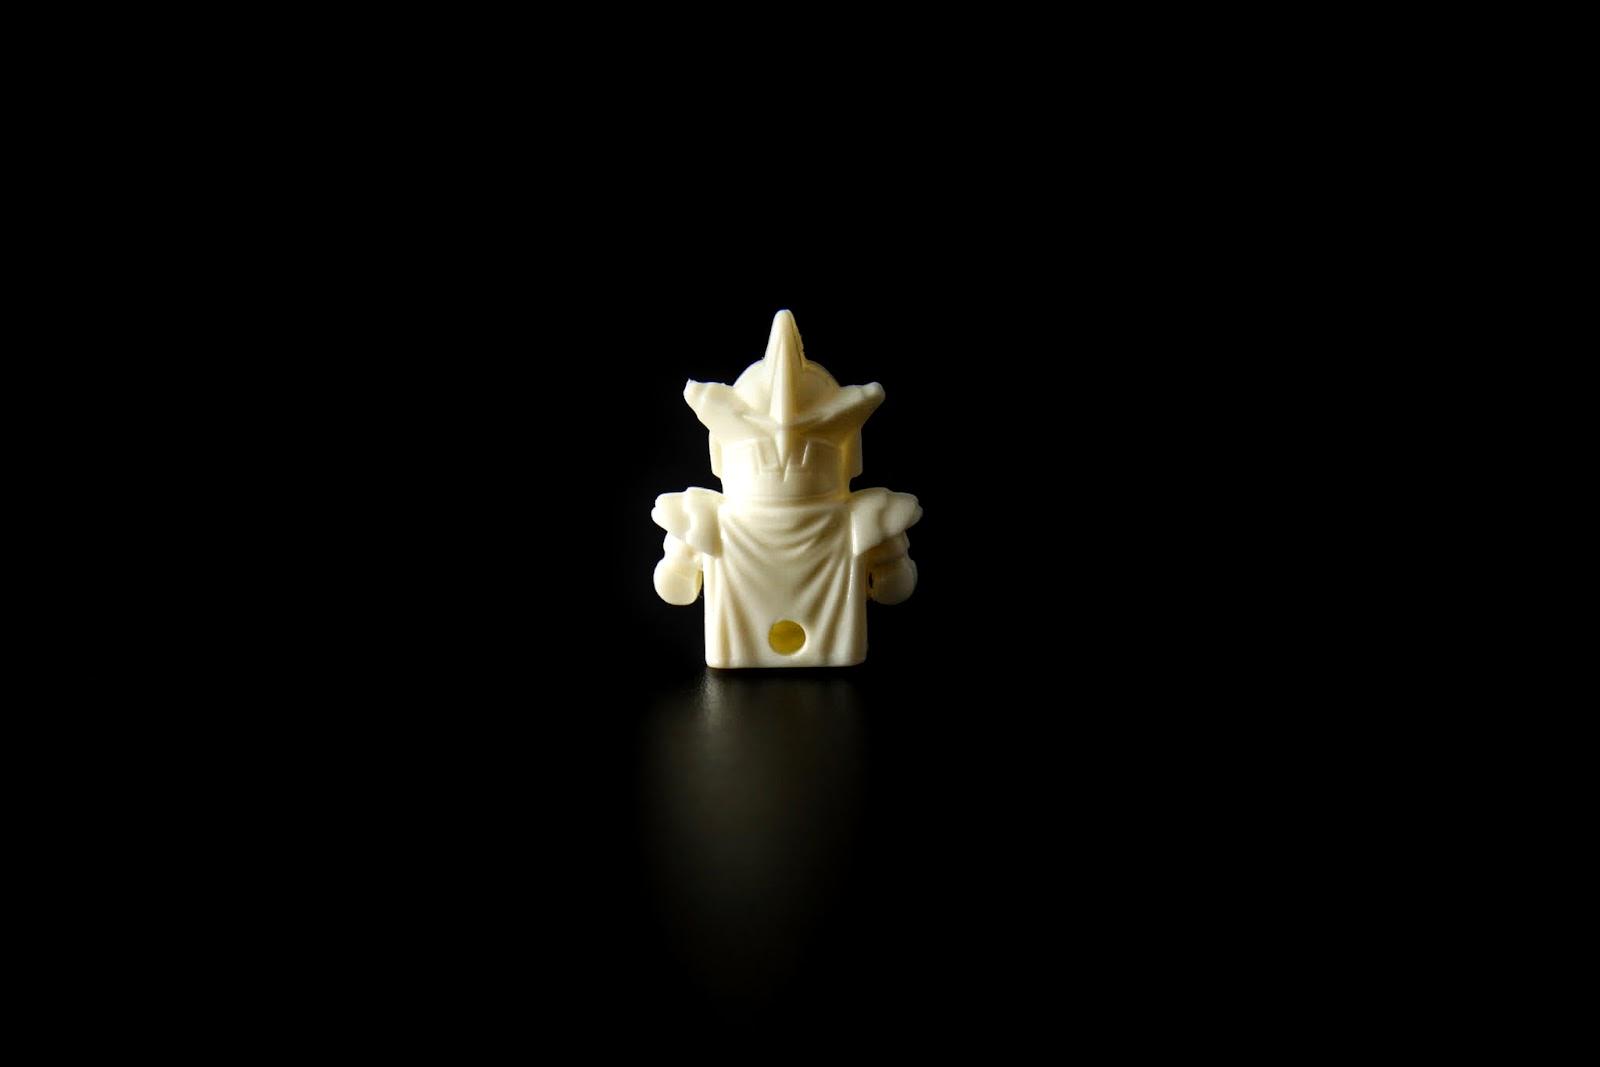 真實身分為月之王國-セレネス的王子